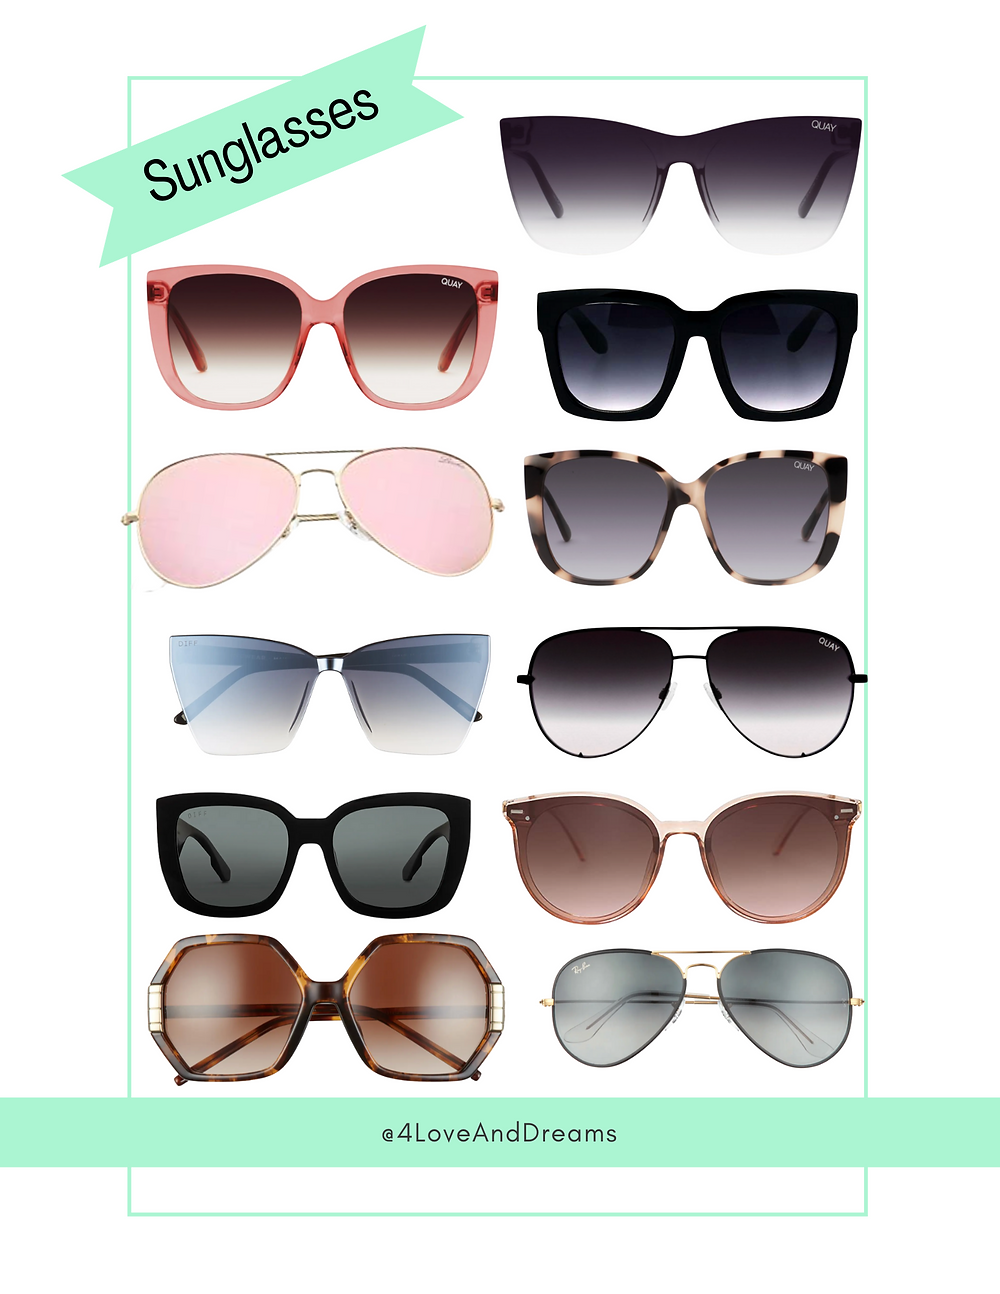 best sunglasses.  affordable sunglasses. best sunglasses for the price.  designer inspired sunglasses.